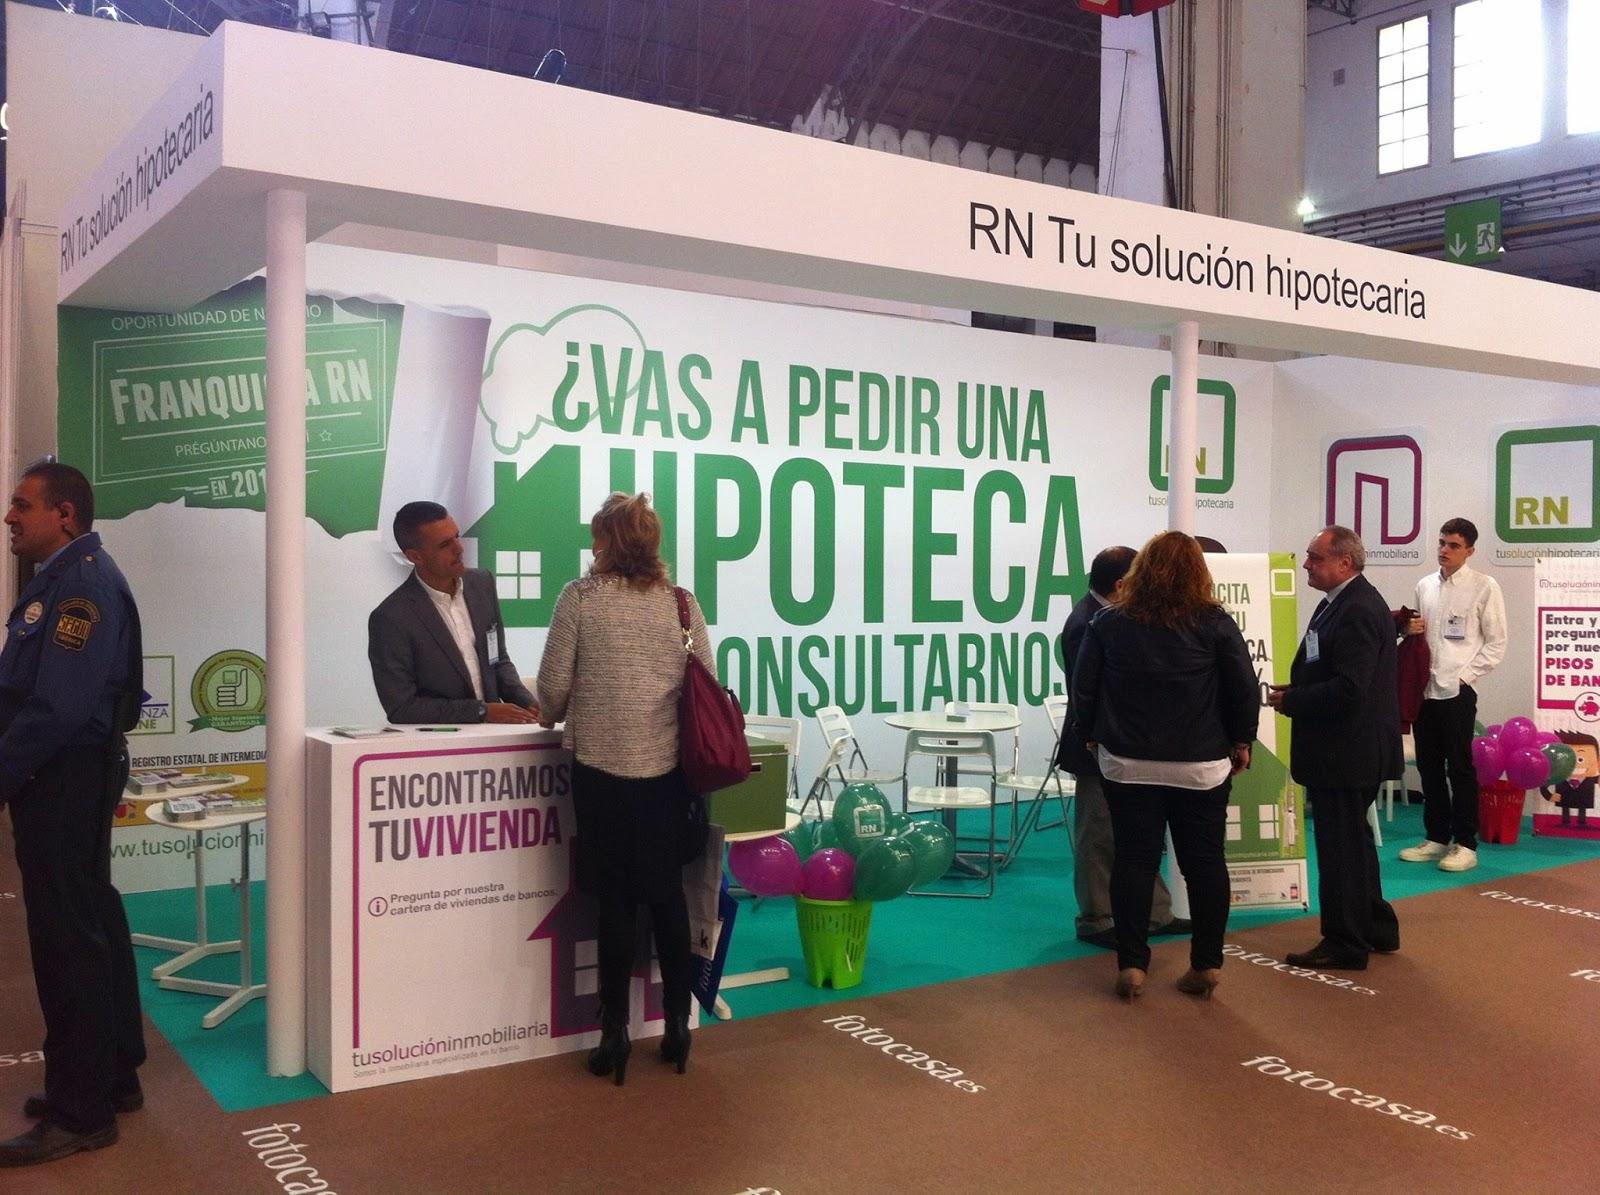 RN Tu solución hipotecaria stand BMP 2014